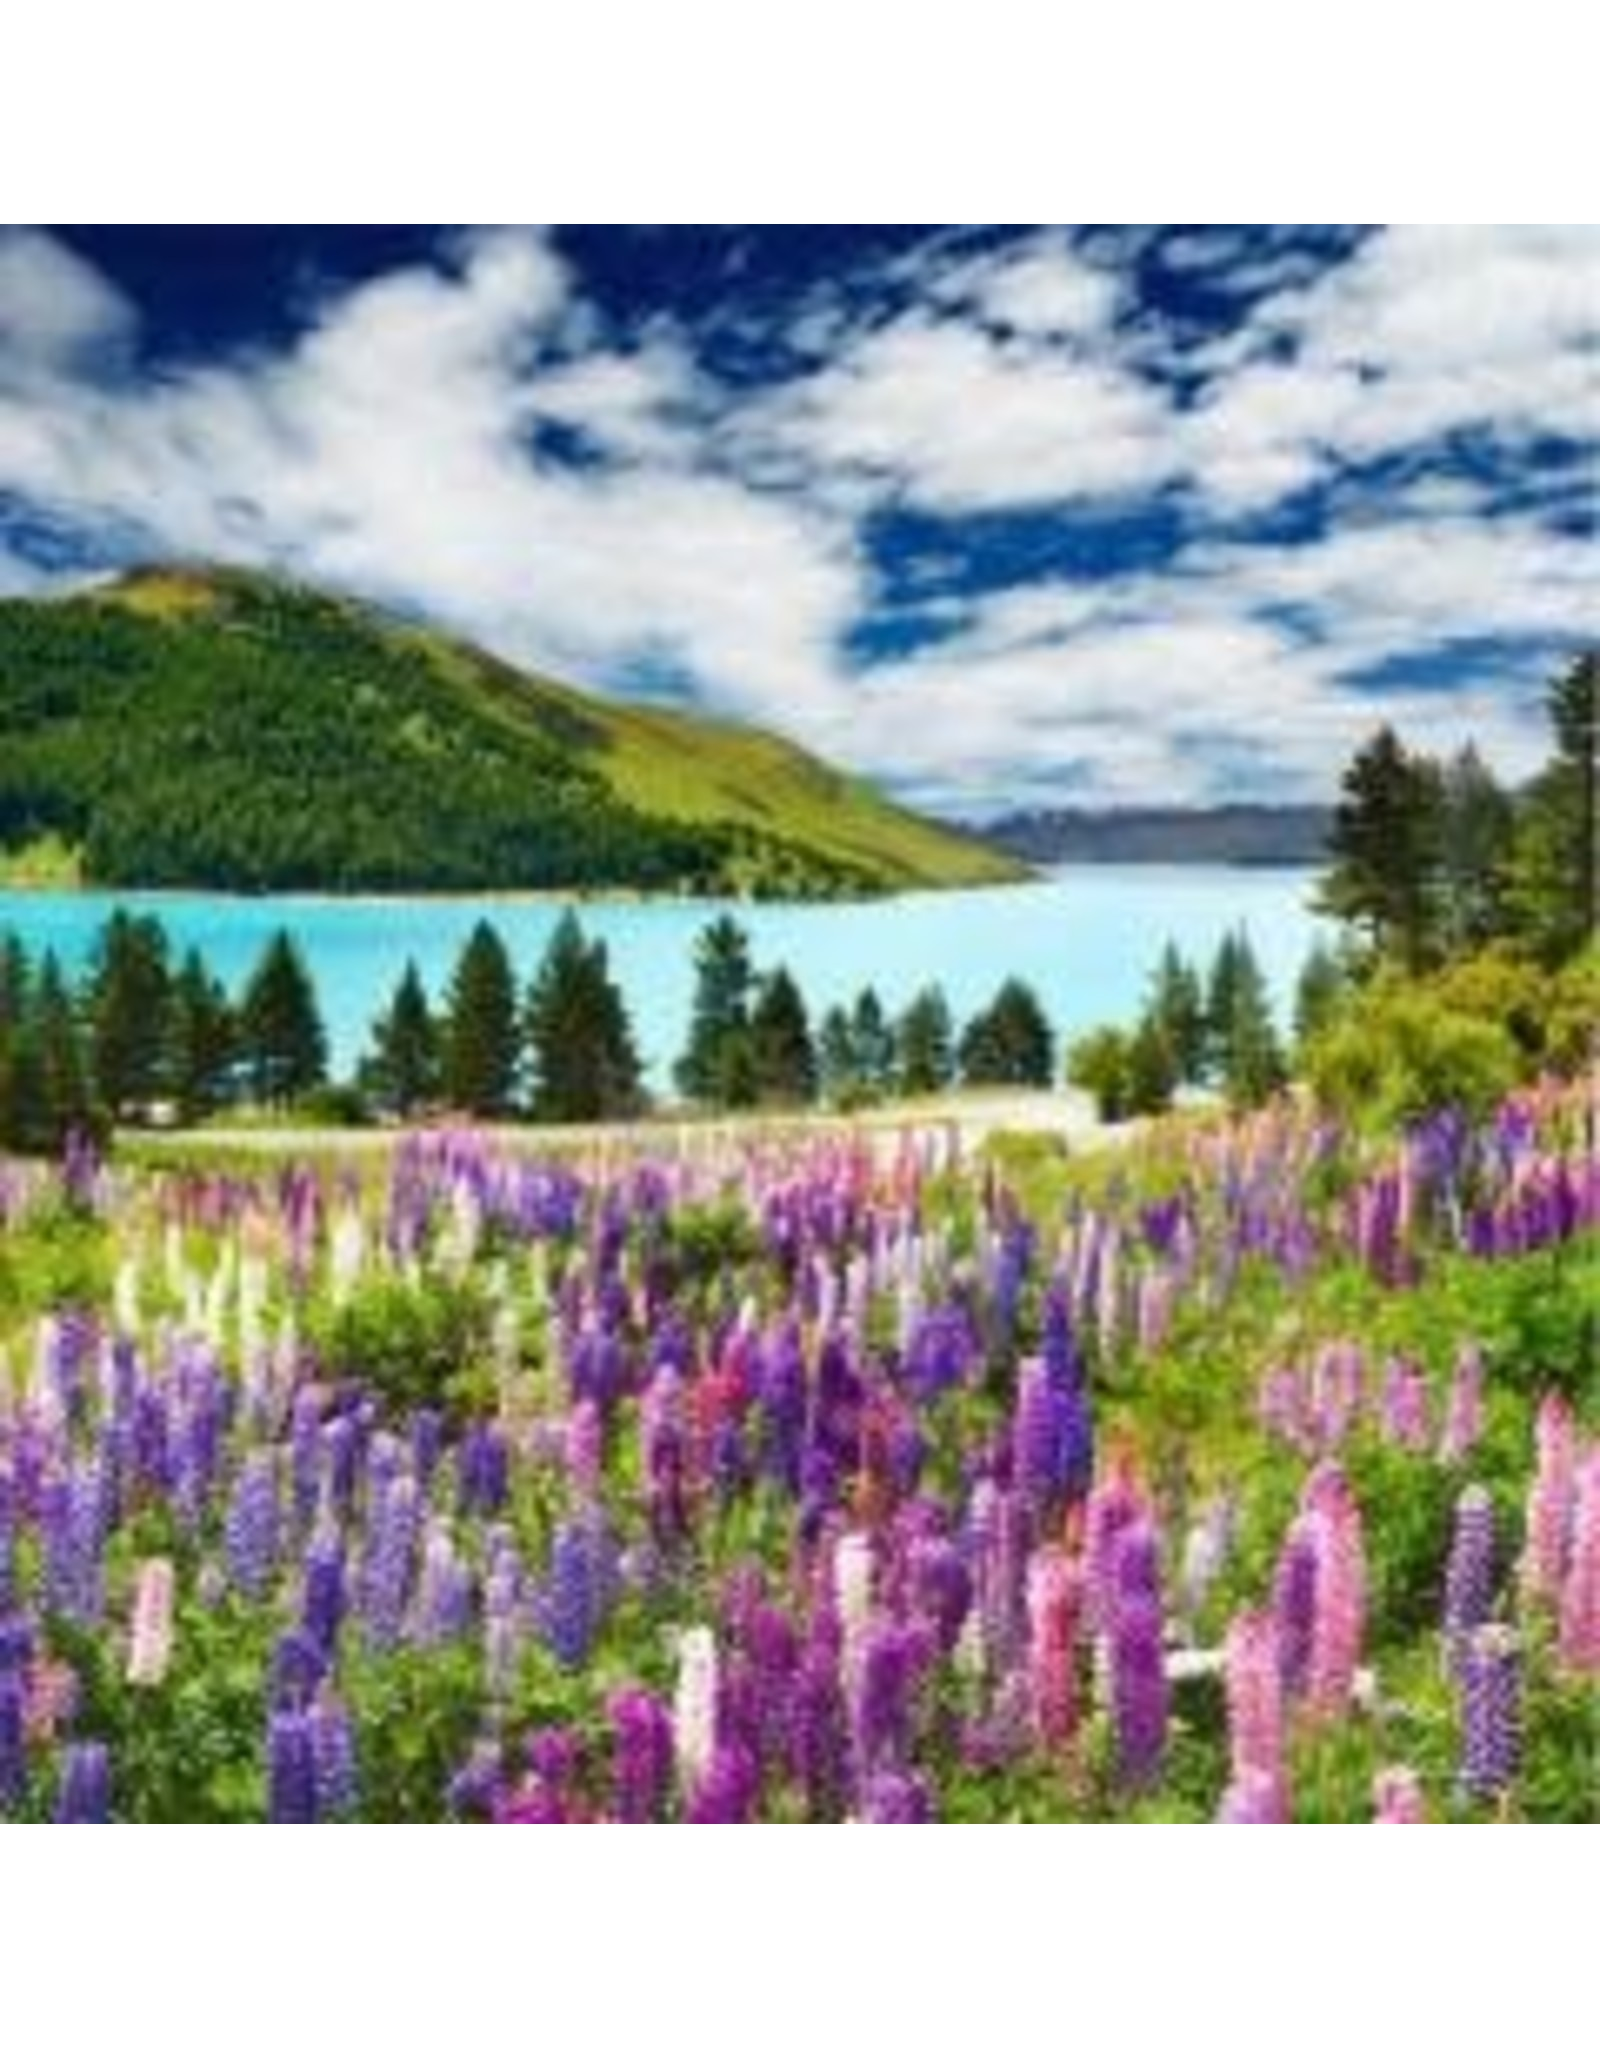 Zen Art & Design Mountain Lake (Md, 204 Pieces, Artisanal Wooden Jigsaw Puzzle)